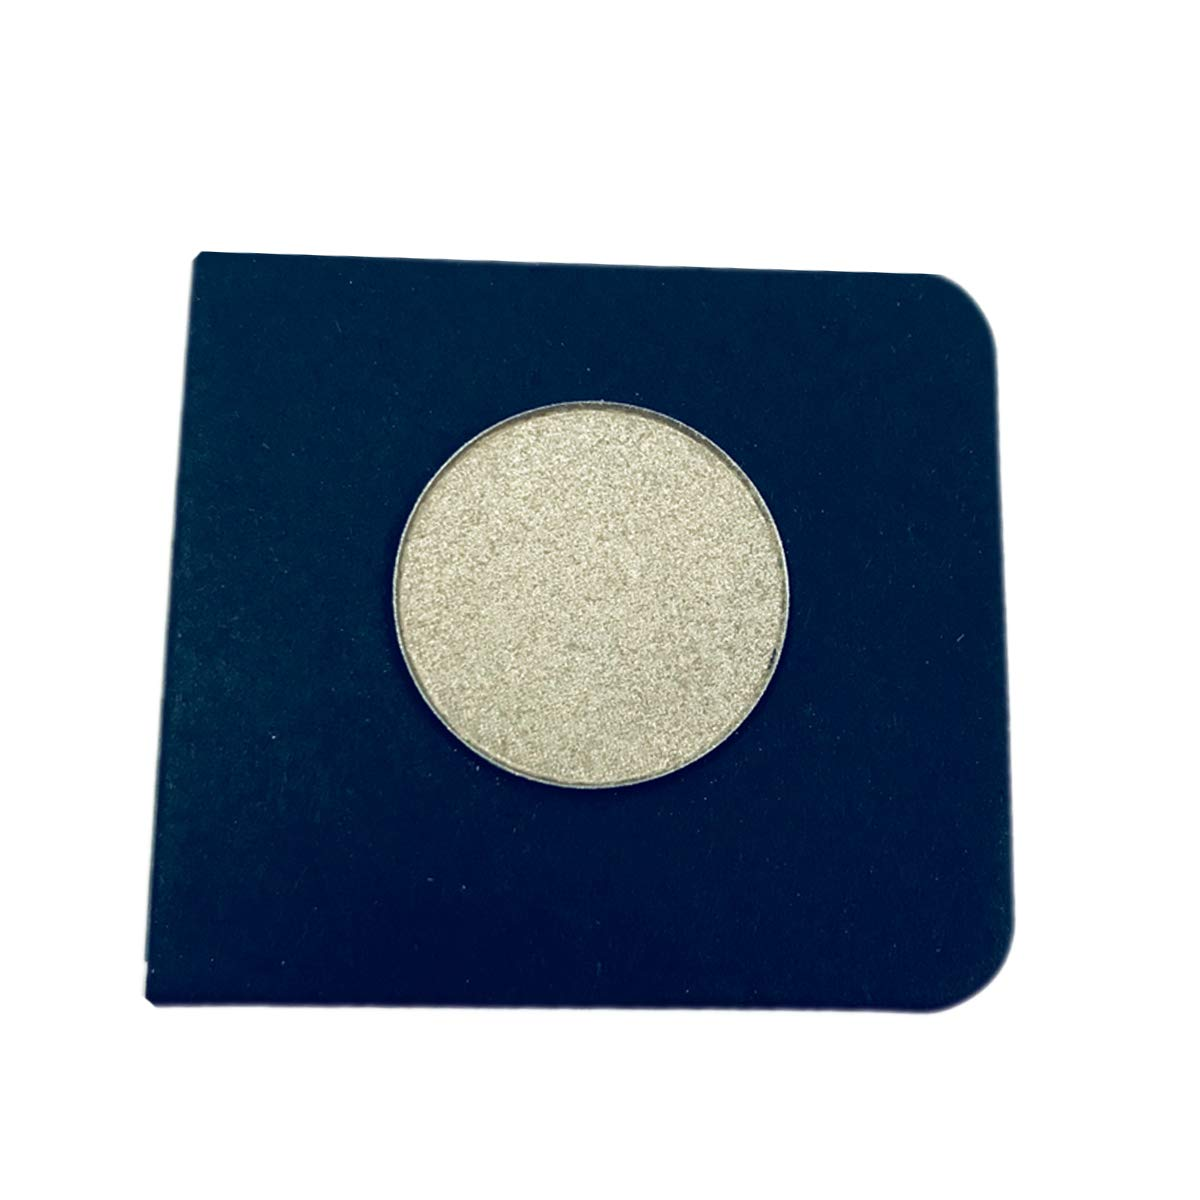 Everfavor Single Eye Shadow Compact, High Pigmented Blendable Eyeshadow Makeup Refill Pan 26mm (Nereus)